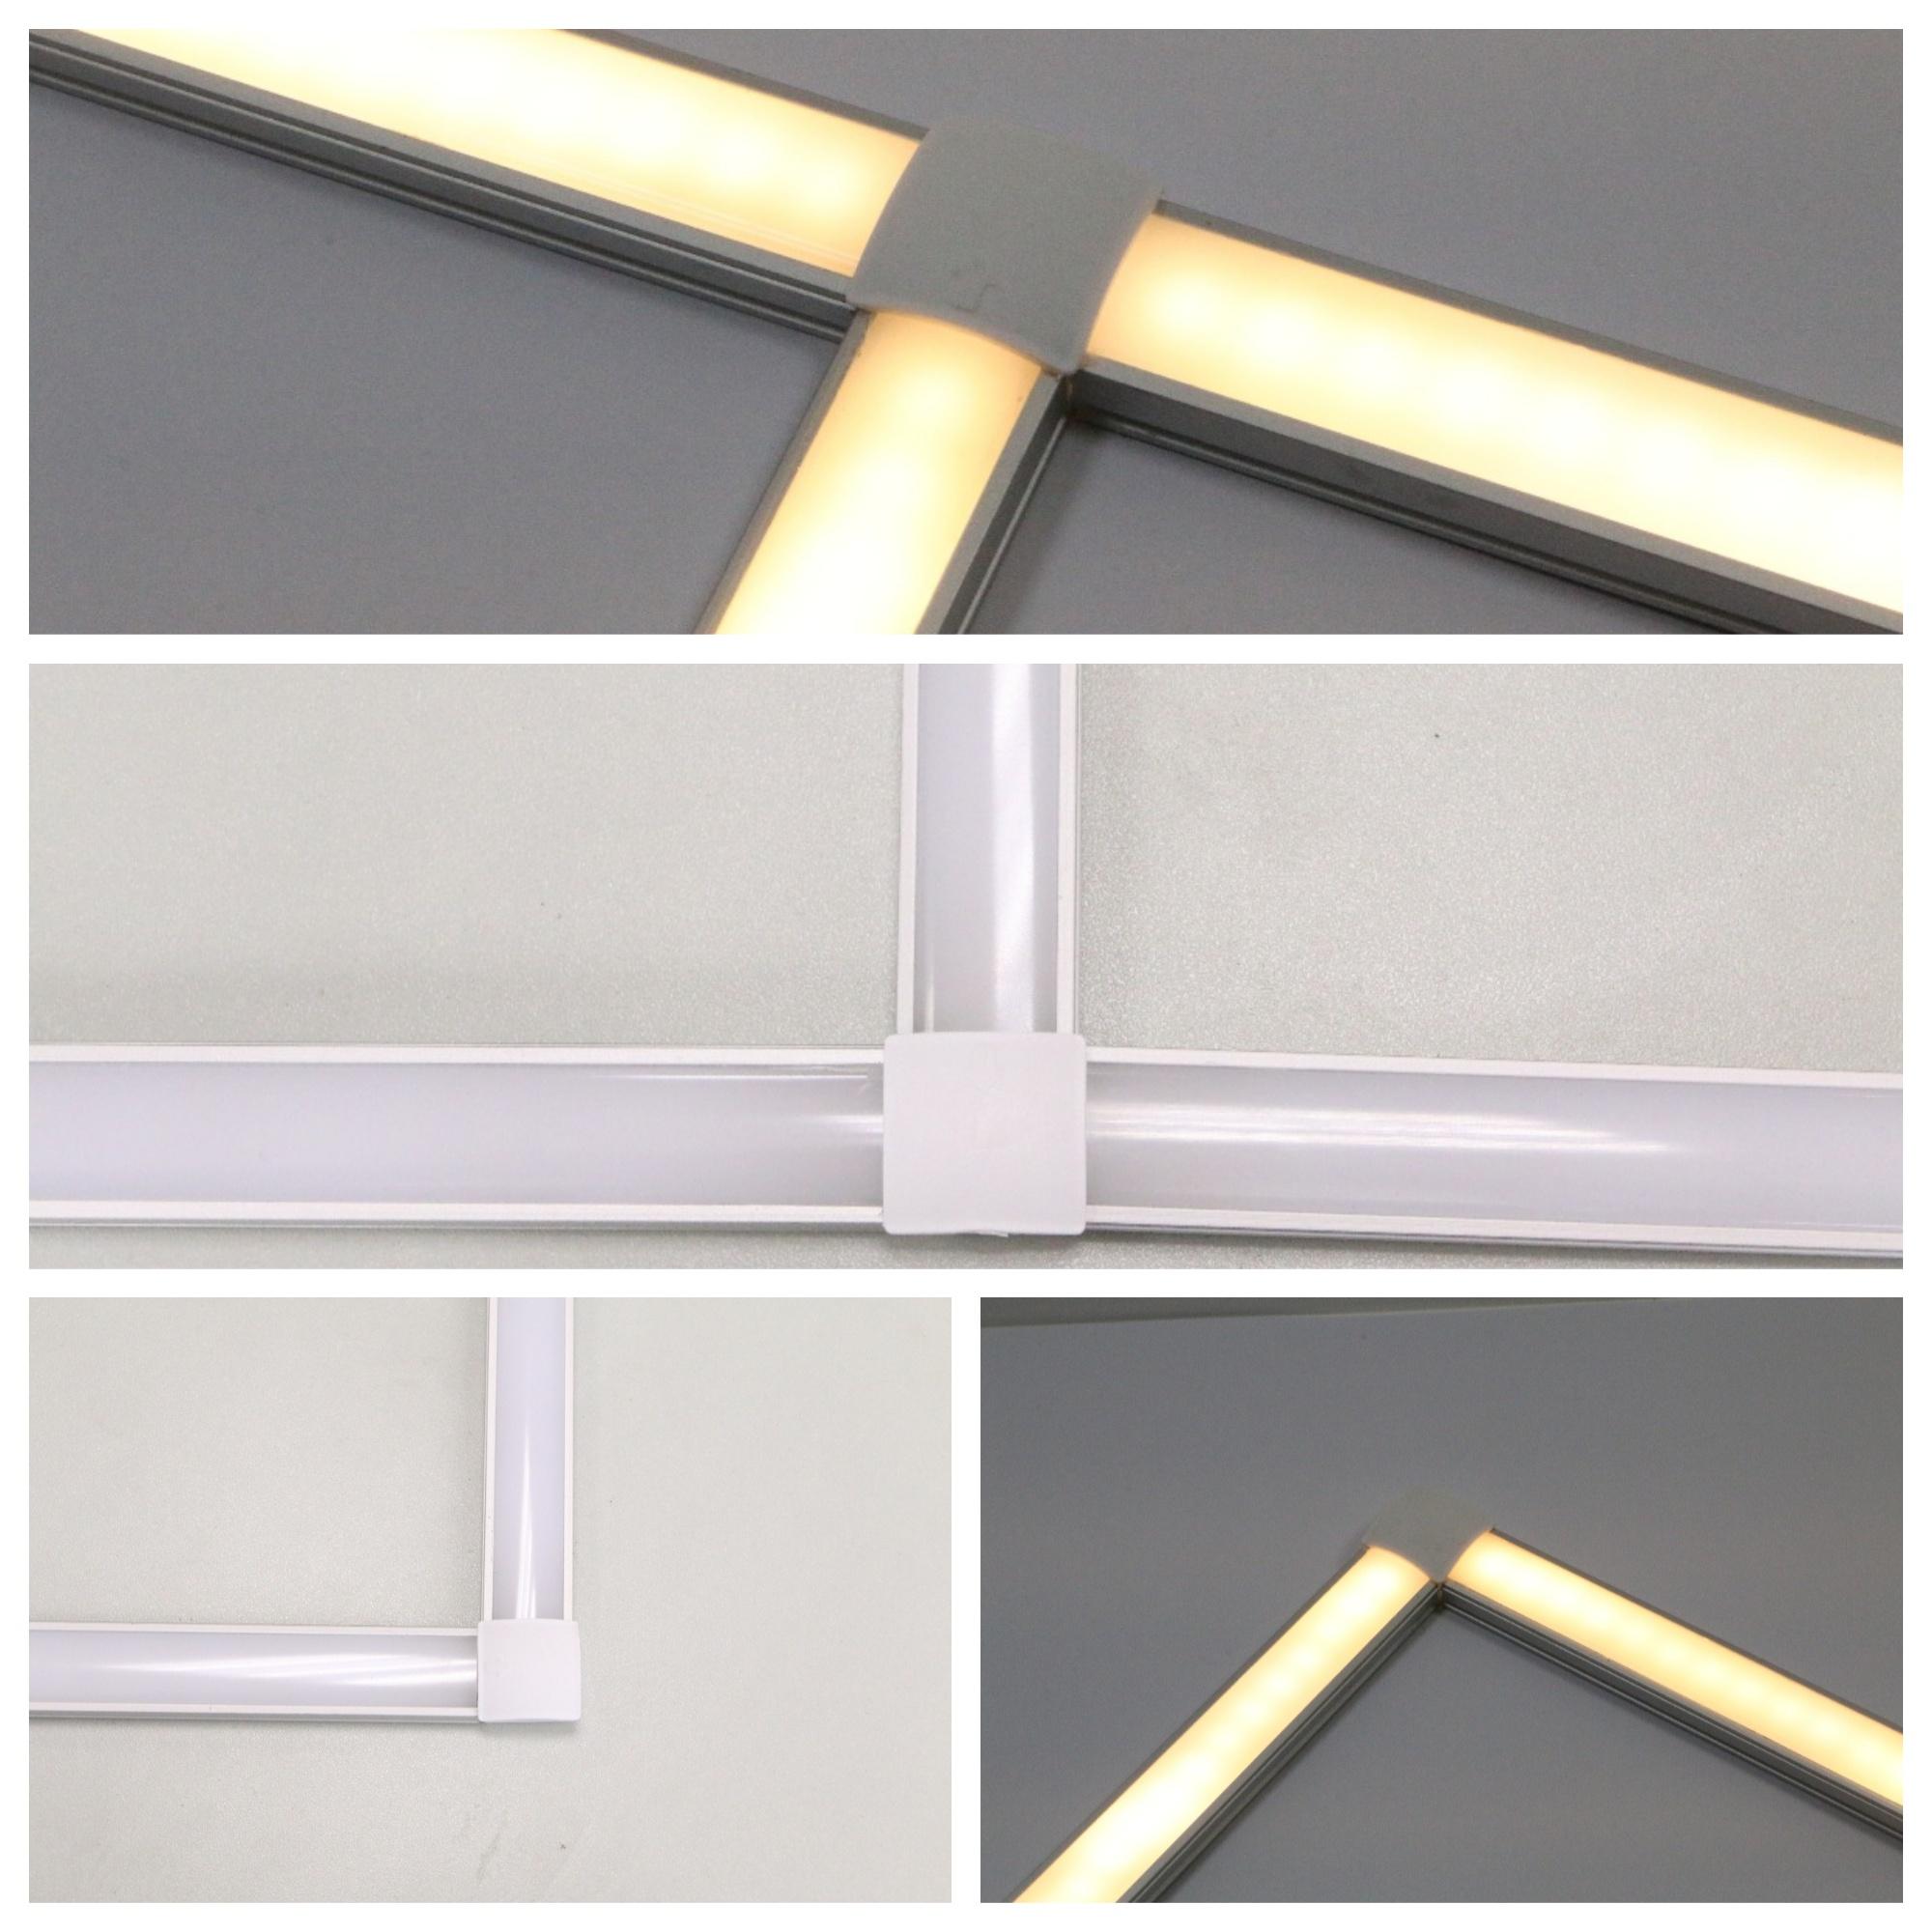 DC24V DIY led cabinet light 0.15m/0.30m/0.60m/0.90m/1.00m/1.20m